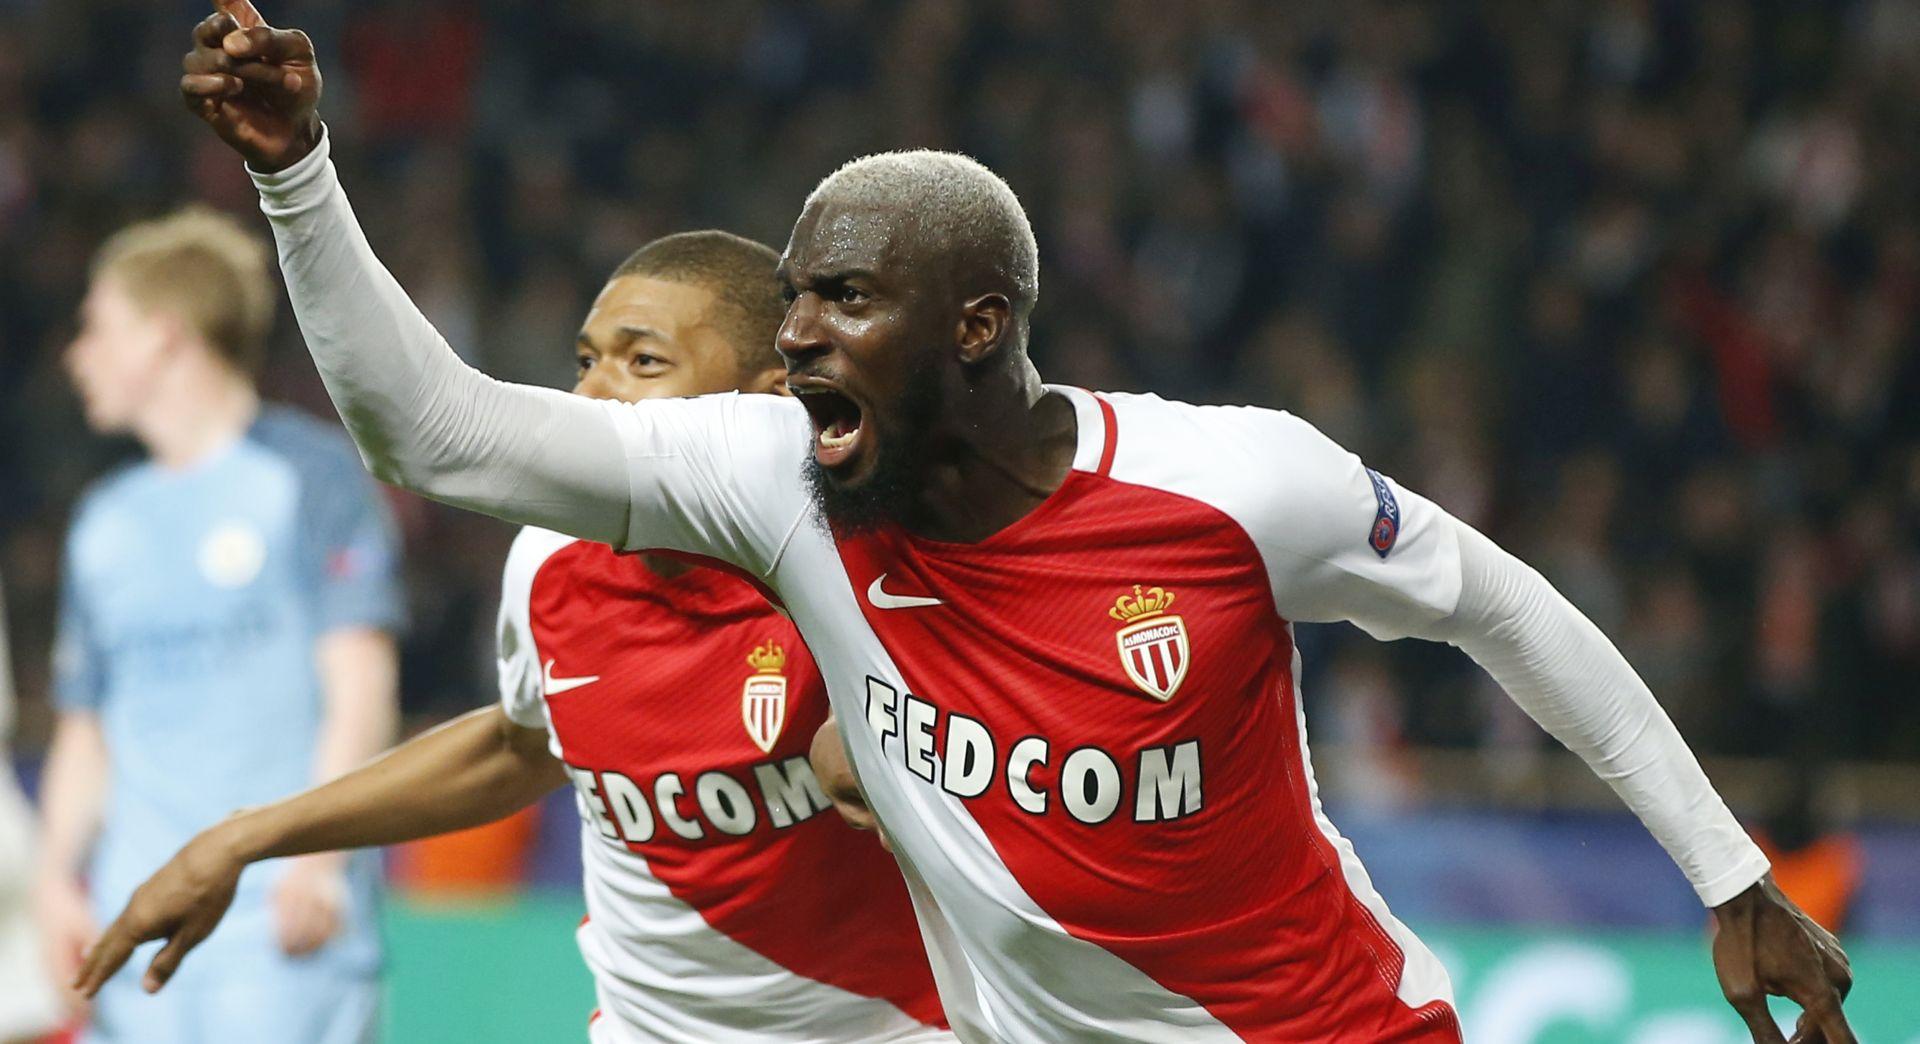 LIGA PRVAKA Atletico i Monaco u četvrtfinalu, luda utakmica u Kneževini